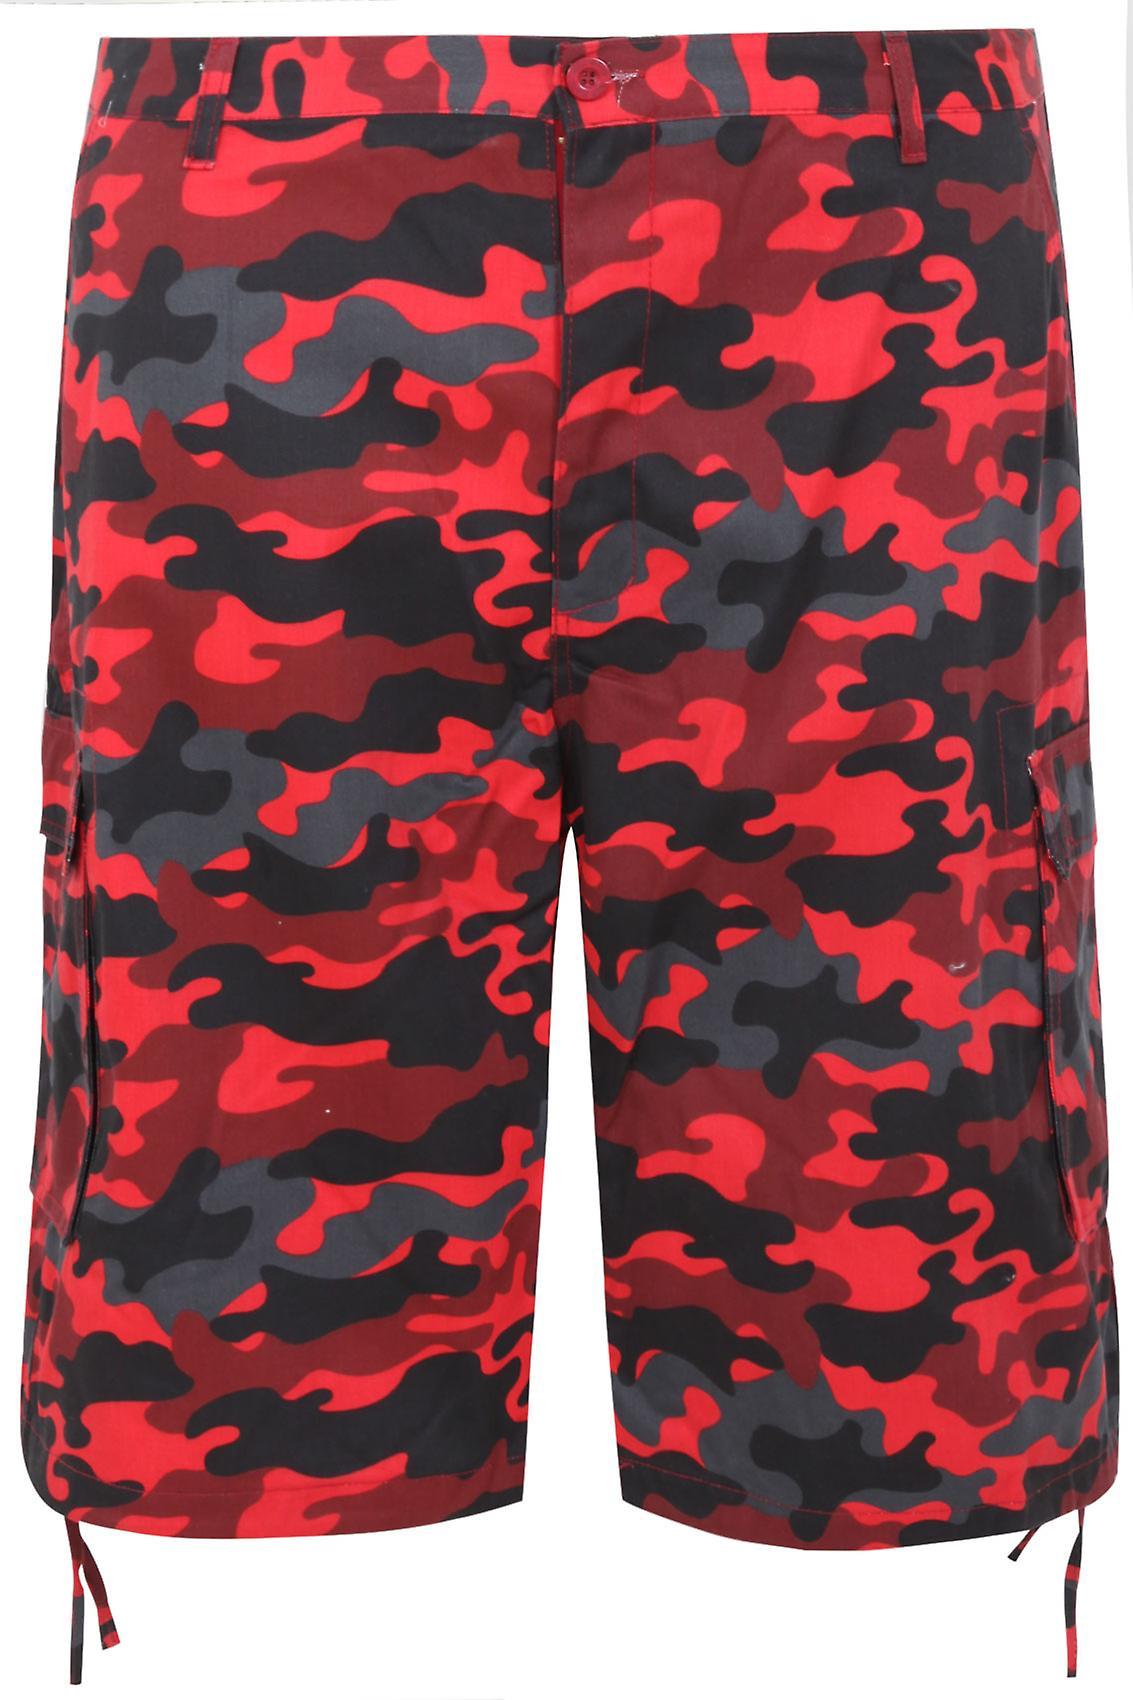 NOIZ Red & Black Camo Print Cotton Cargo Shorts With Pockets